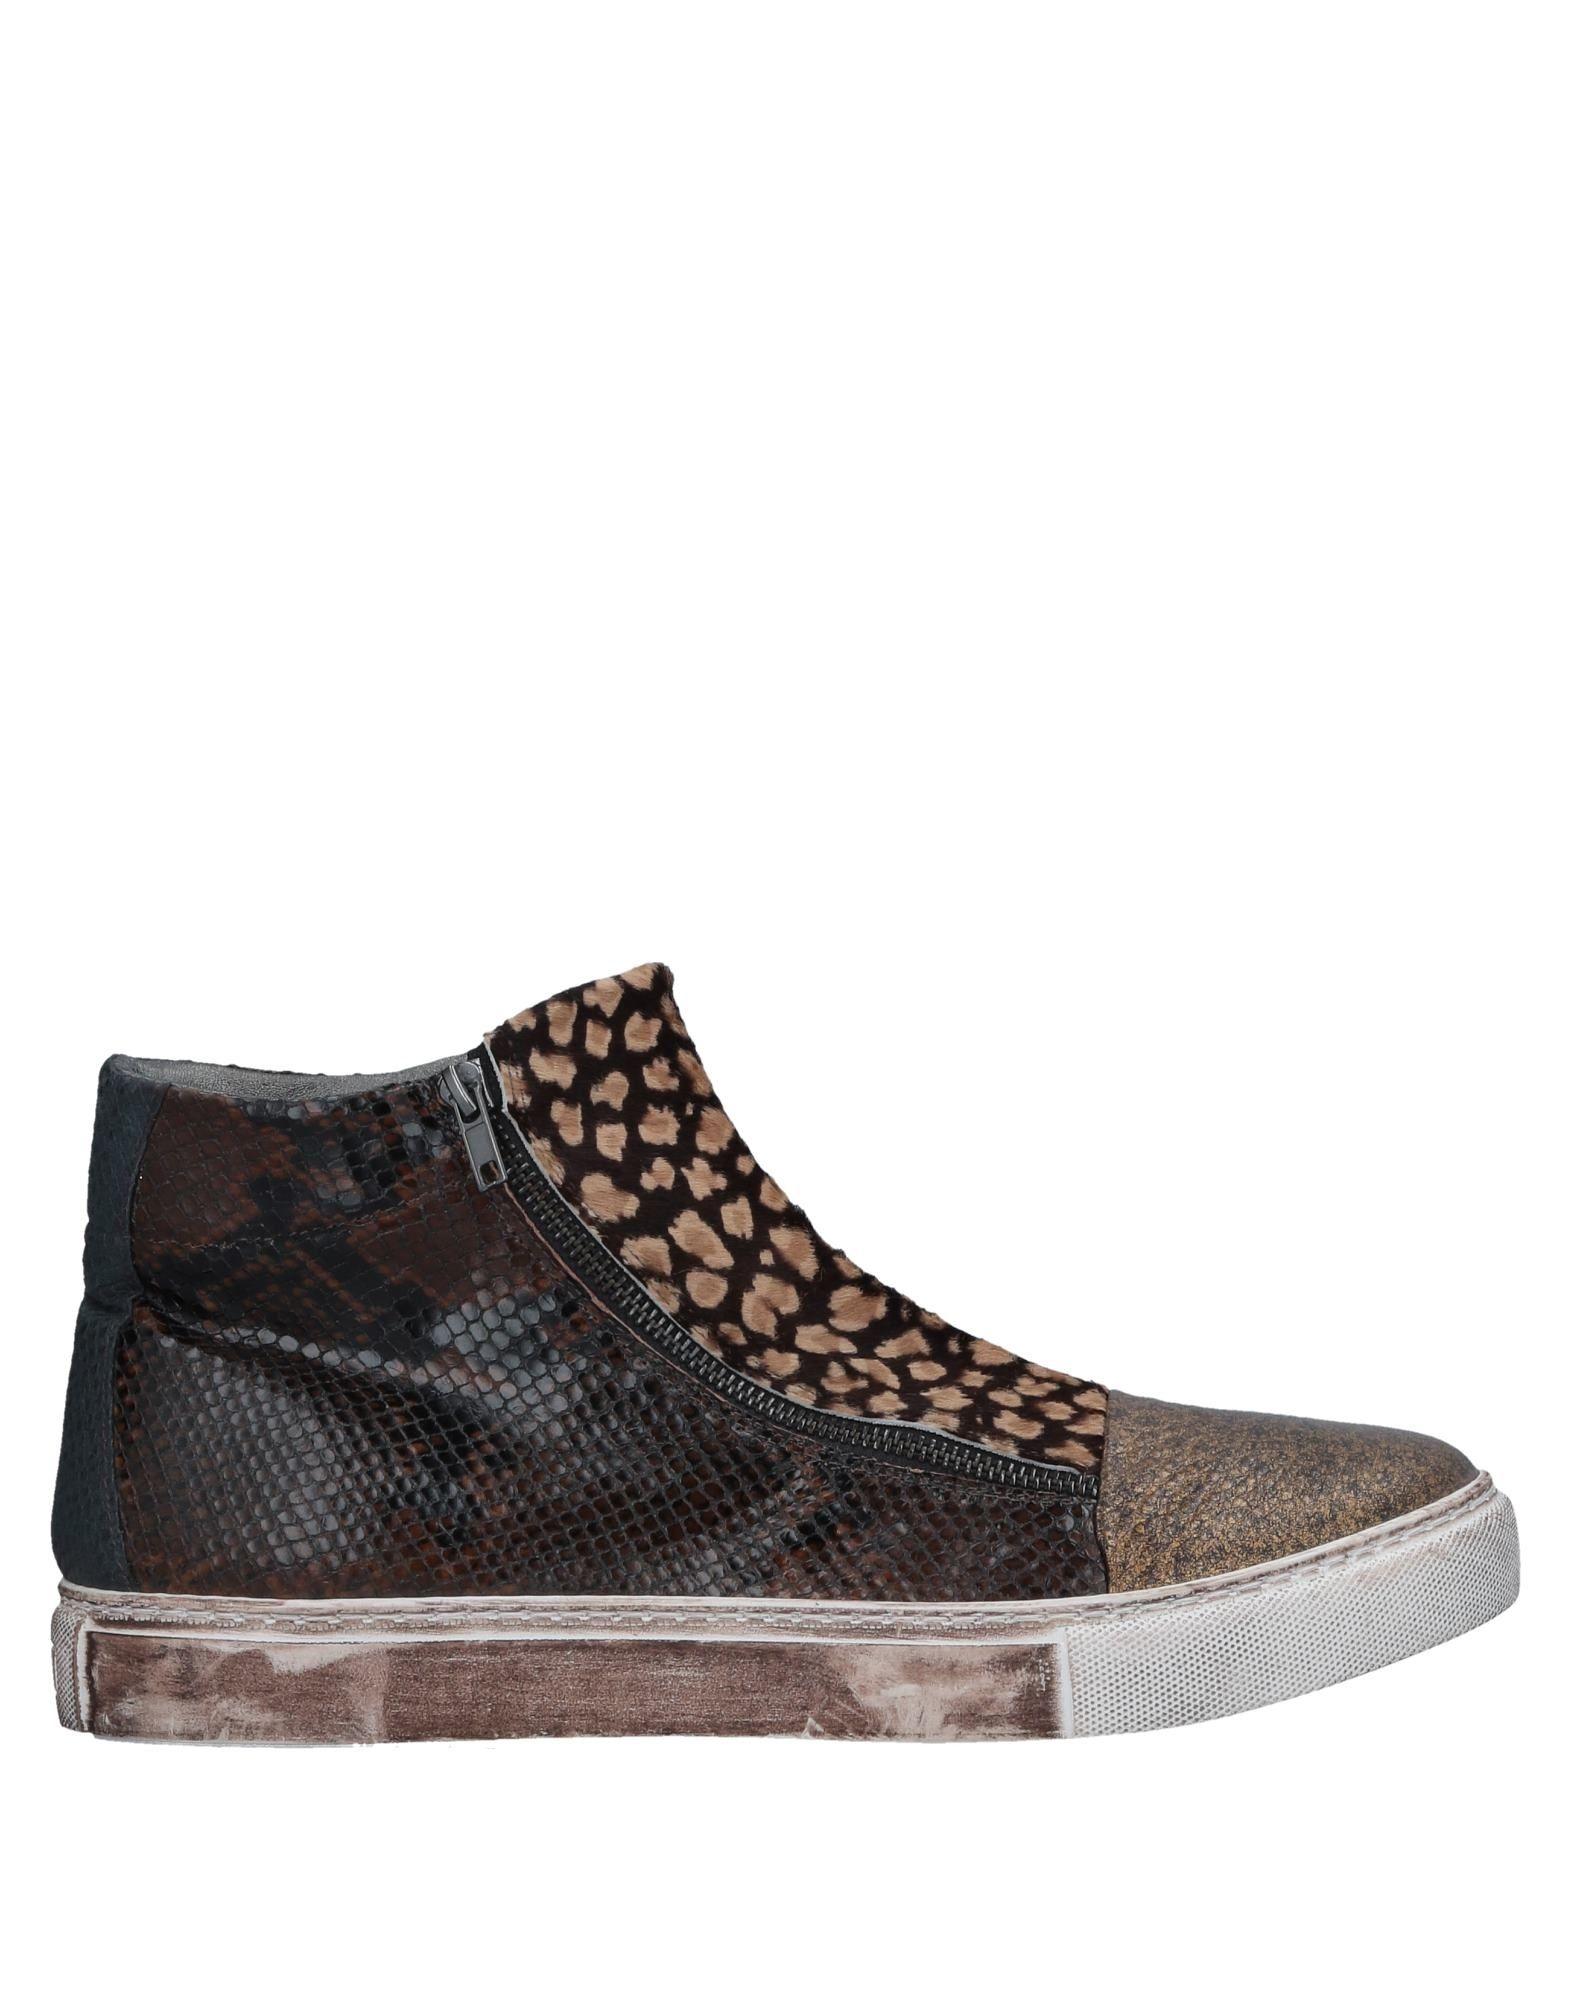 Moda Sneakers Ebarrito Uomo - 11521355IW